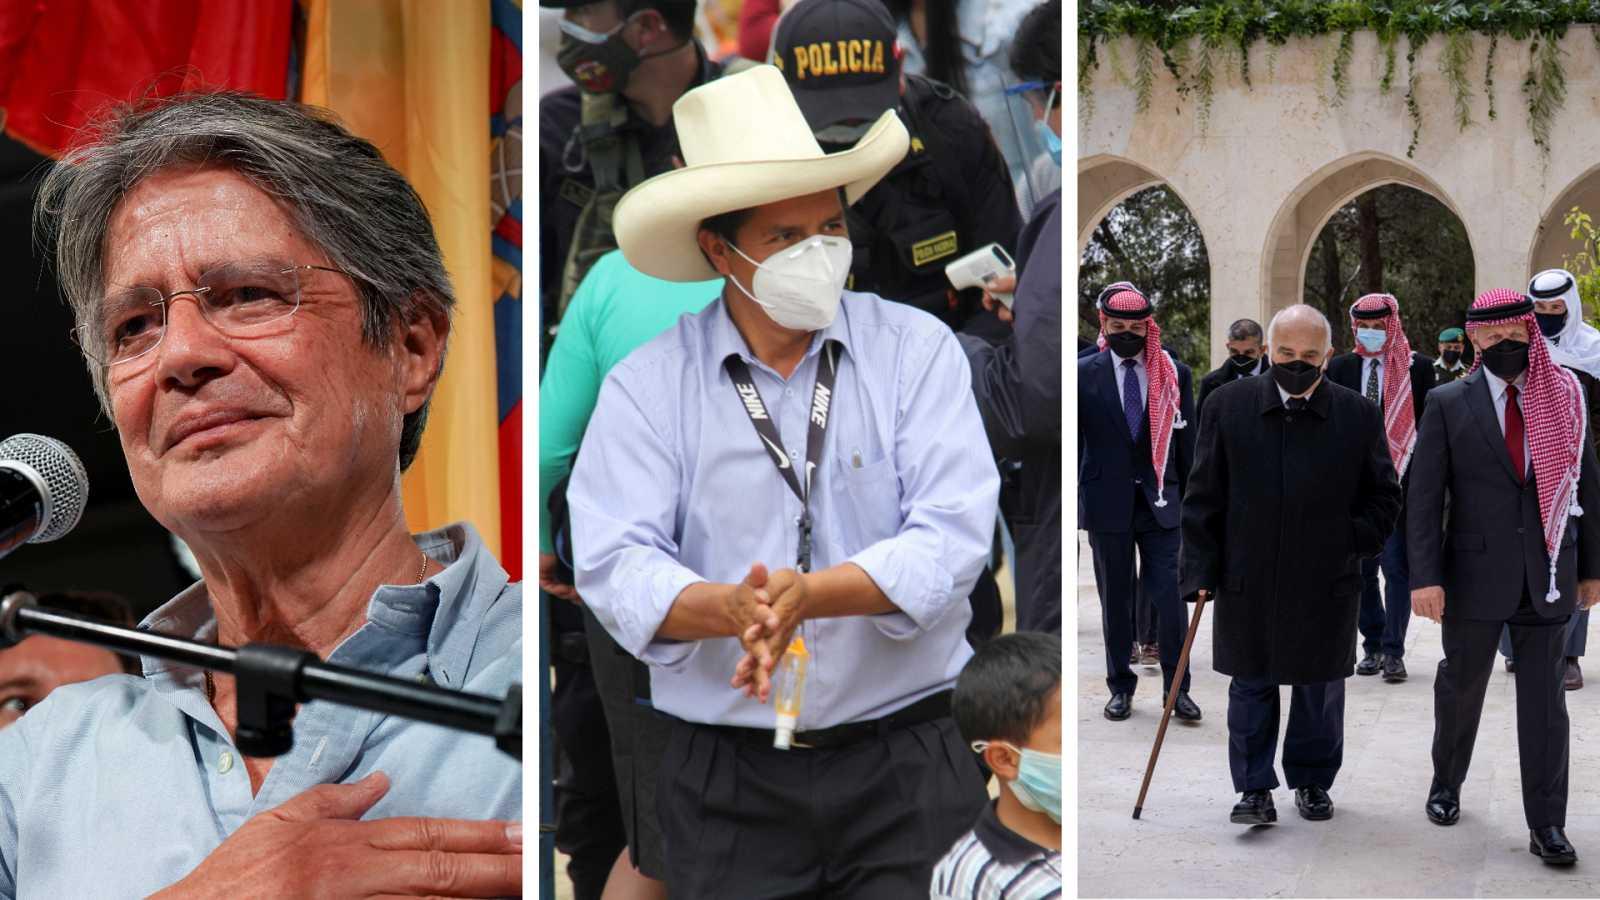 Cinco continentes - Cambio de rumbo político en Ecuador - Escuchar ahora